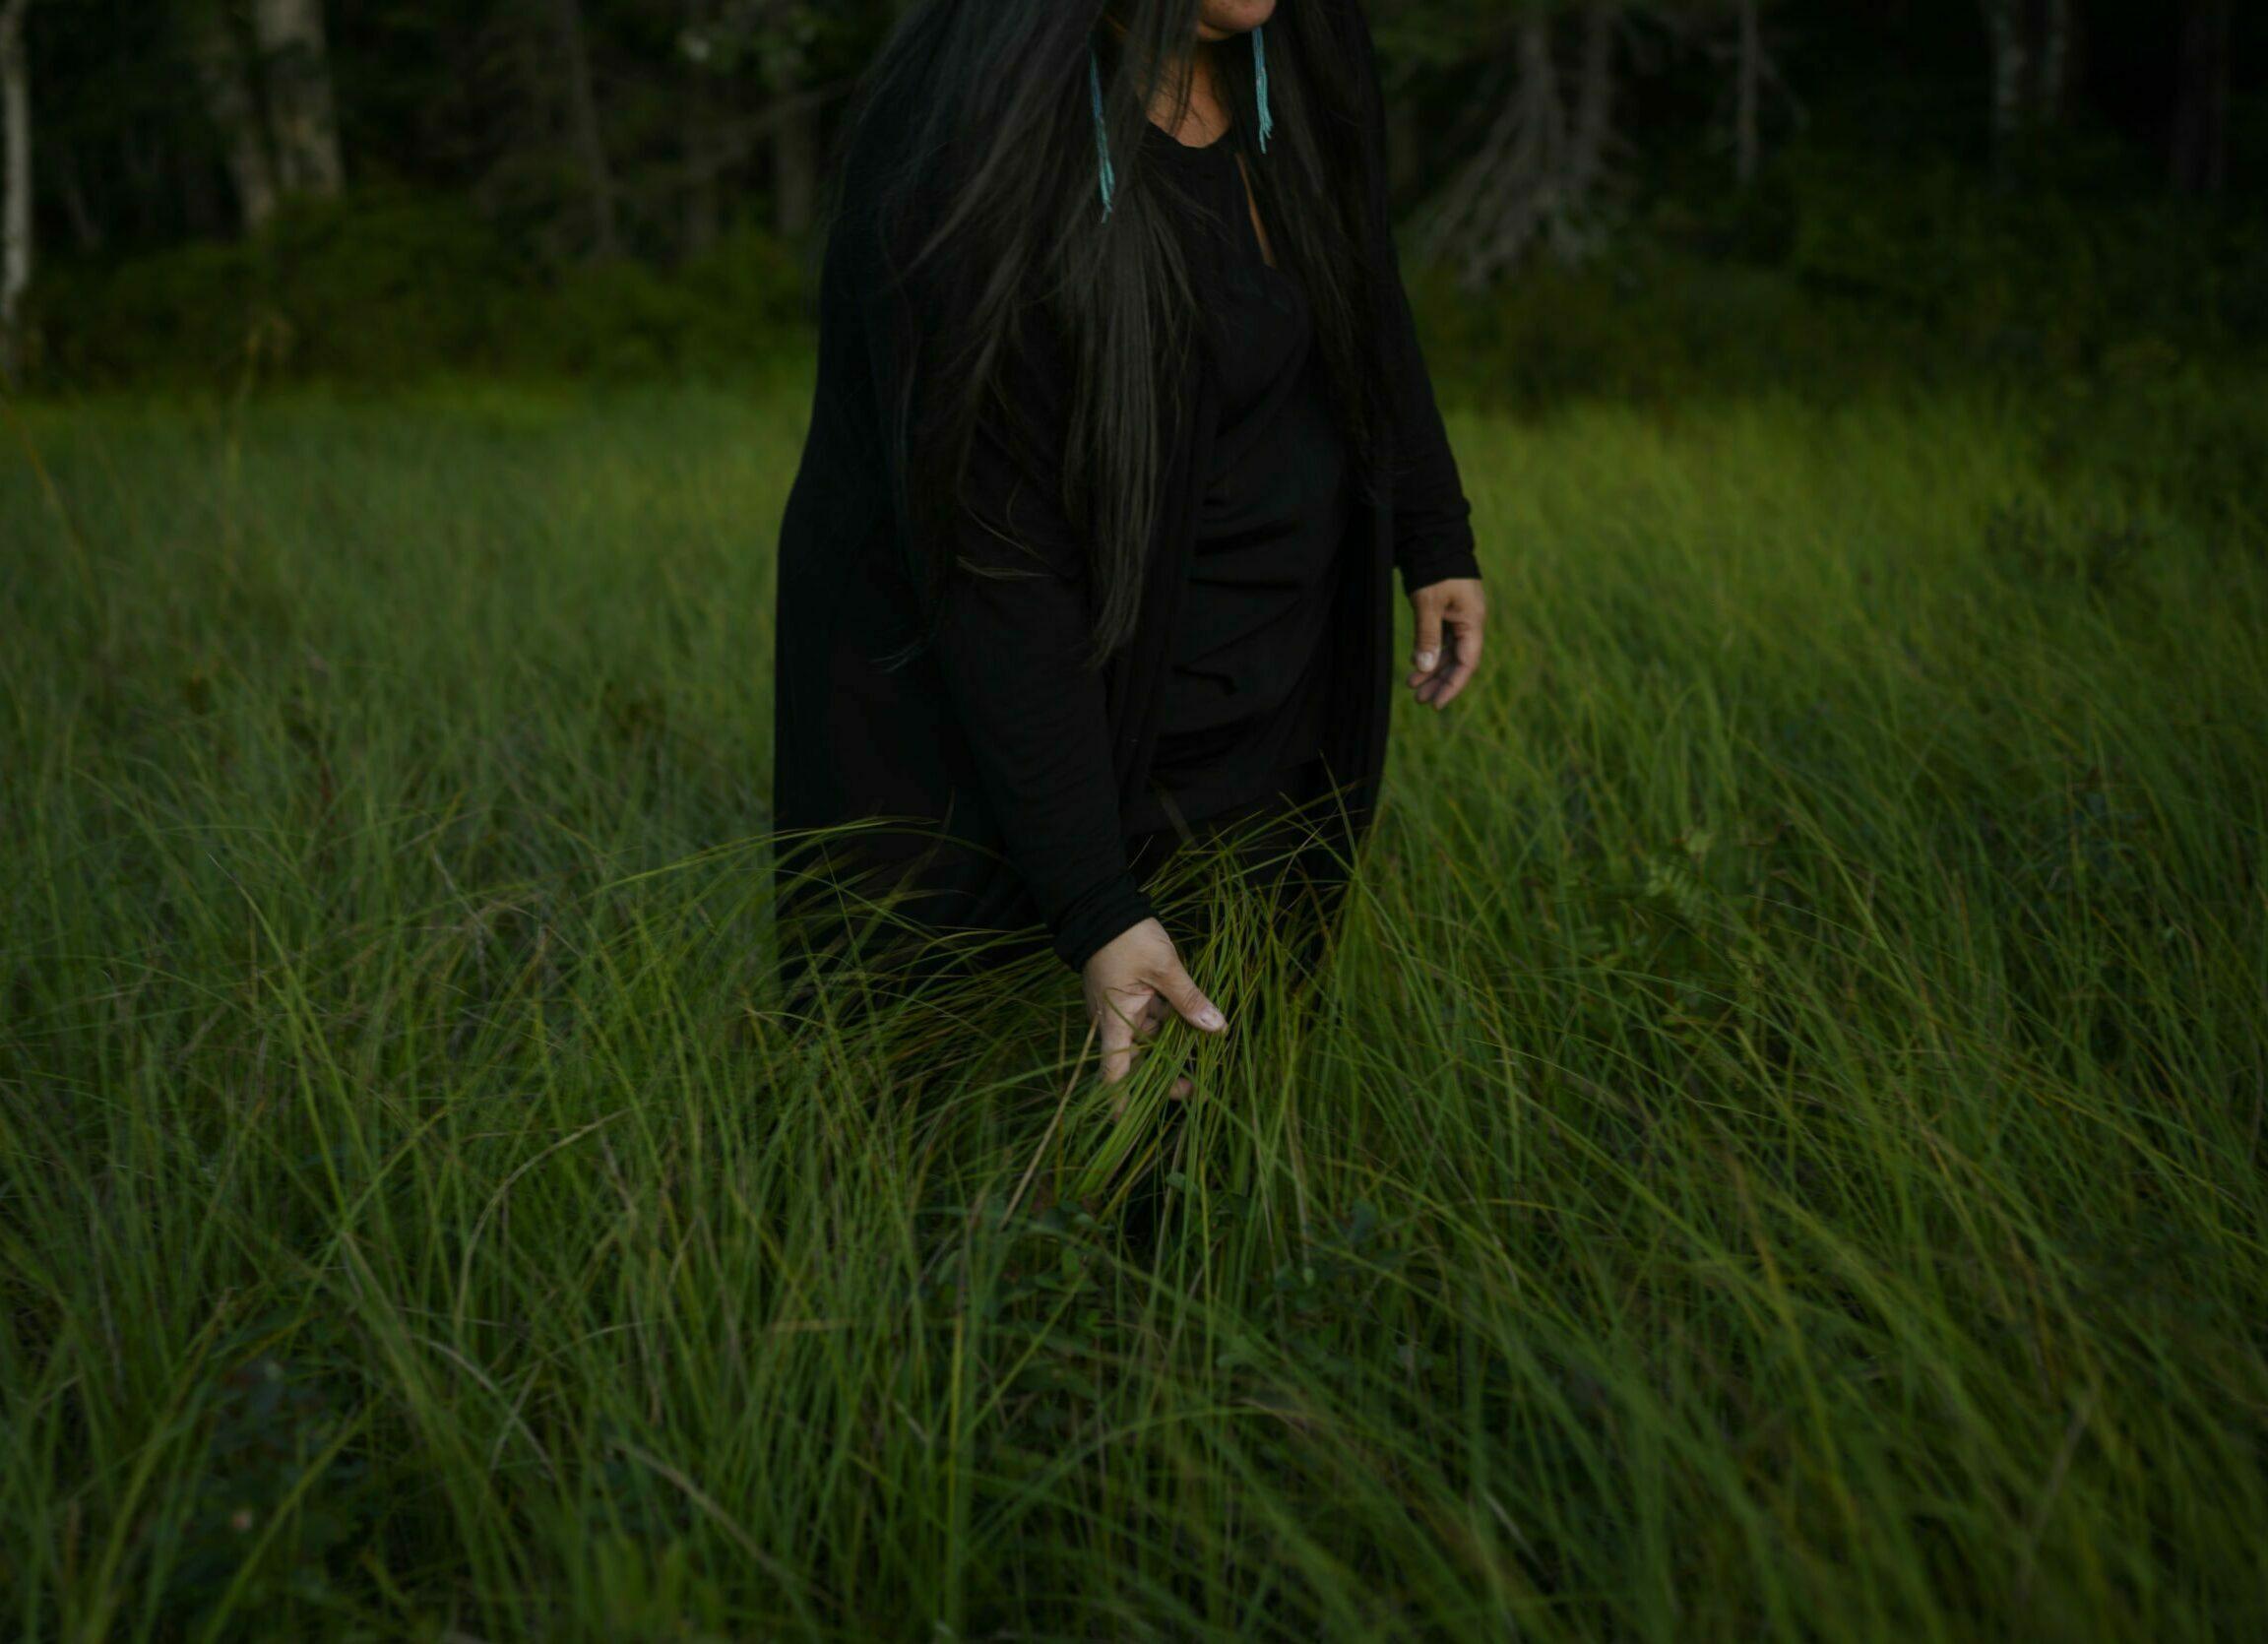 Melissa Labrador runs her hand through the tall grass